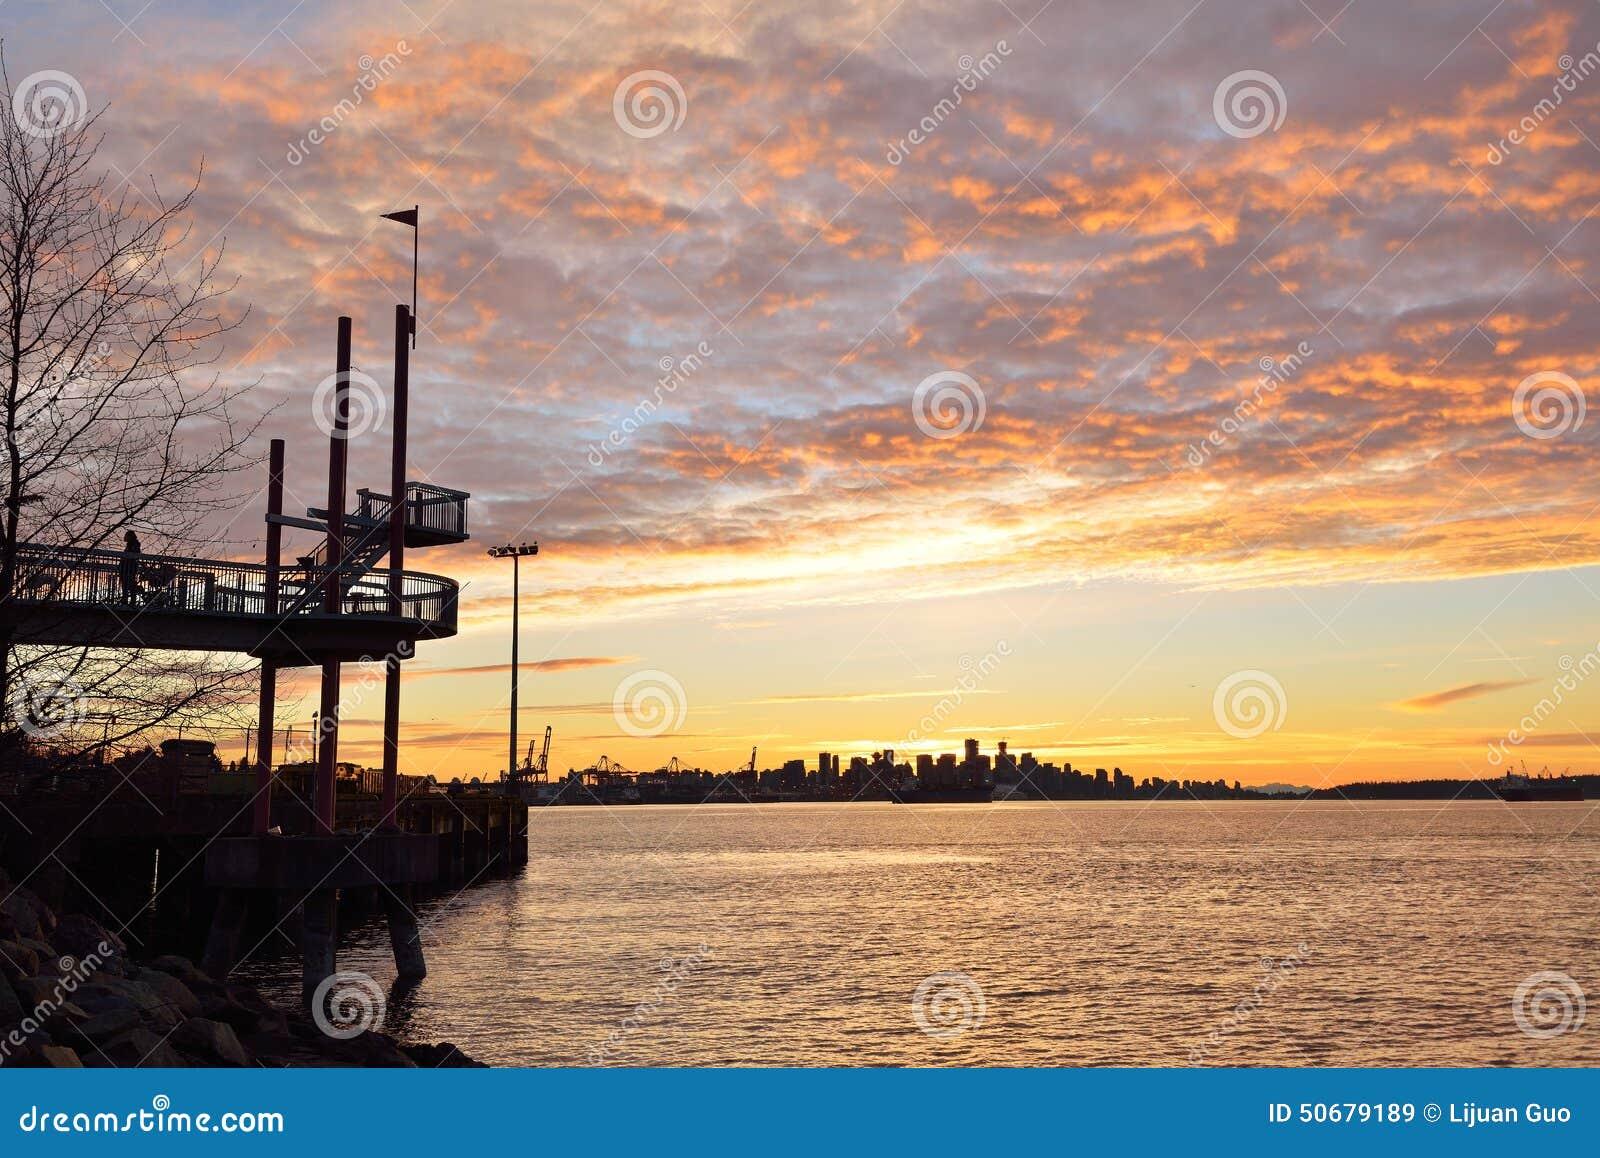 Download 北温哥华区Harbourview公园日落 库存图片. 图片 包括有 码头, 日落, 哥伦比亚, 海洋, 温哥华 - 50679189